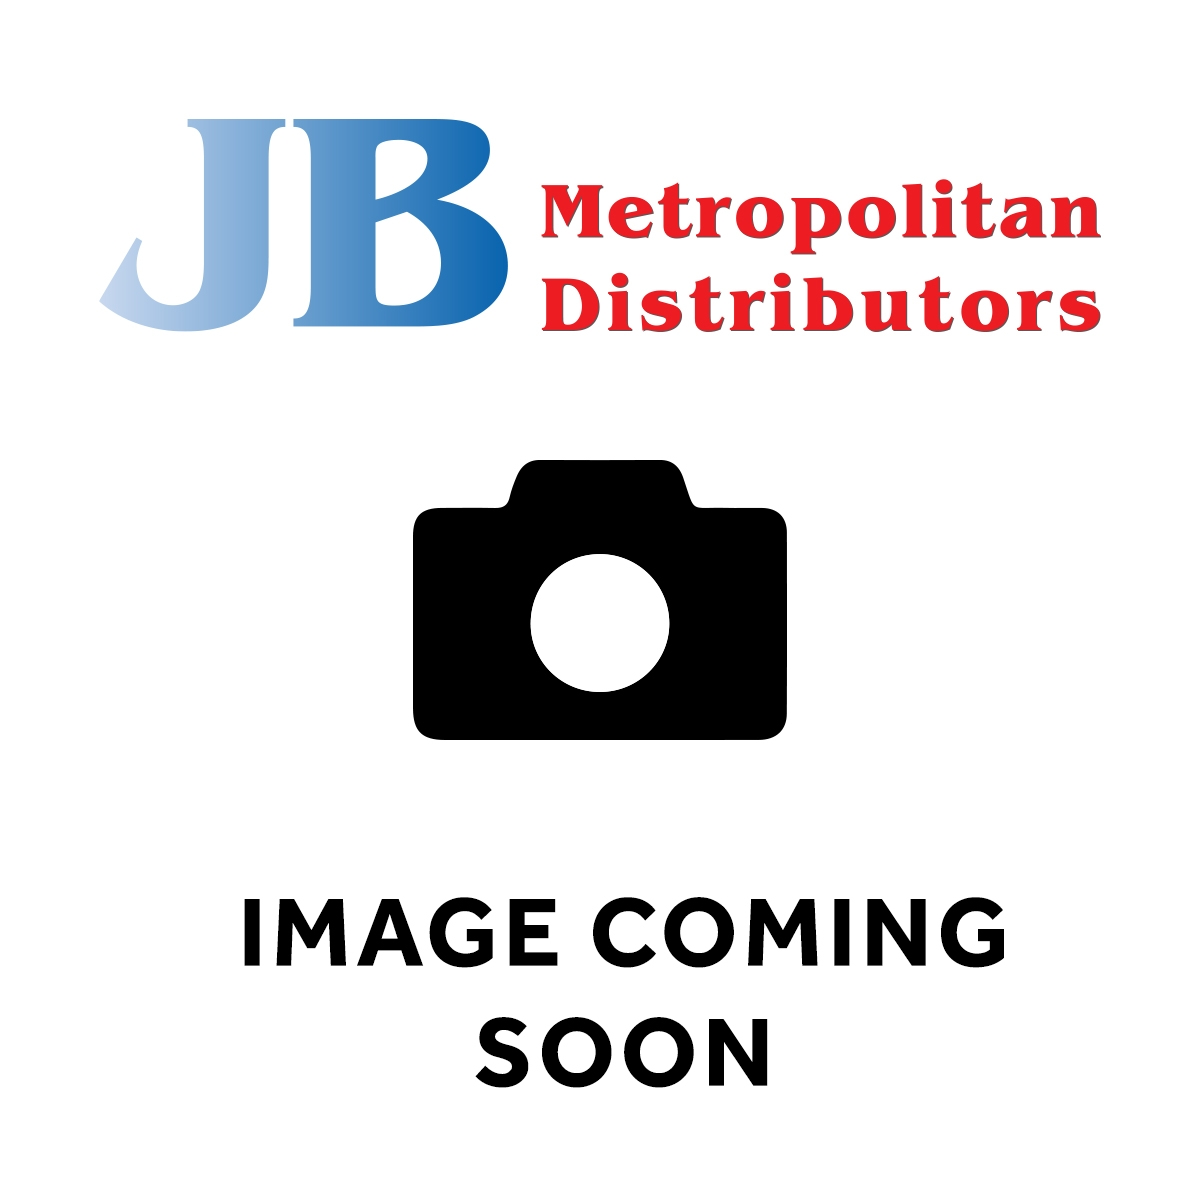 30G MENTOS BOTTLE STRAWBERRY